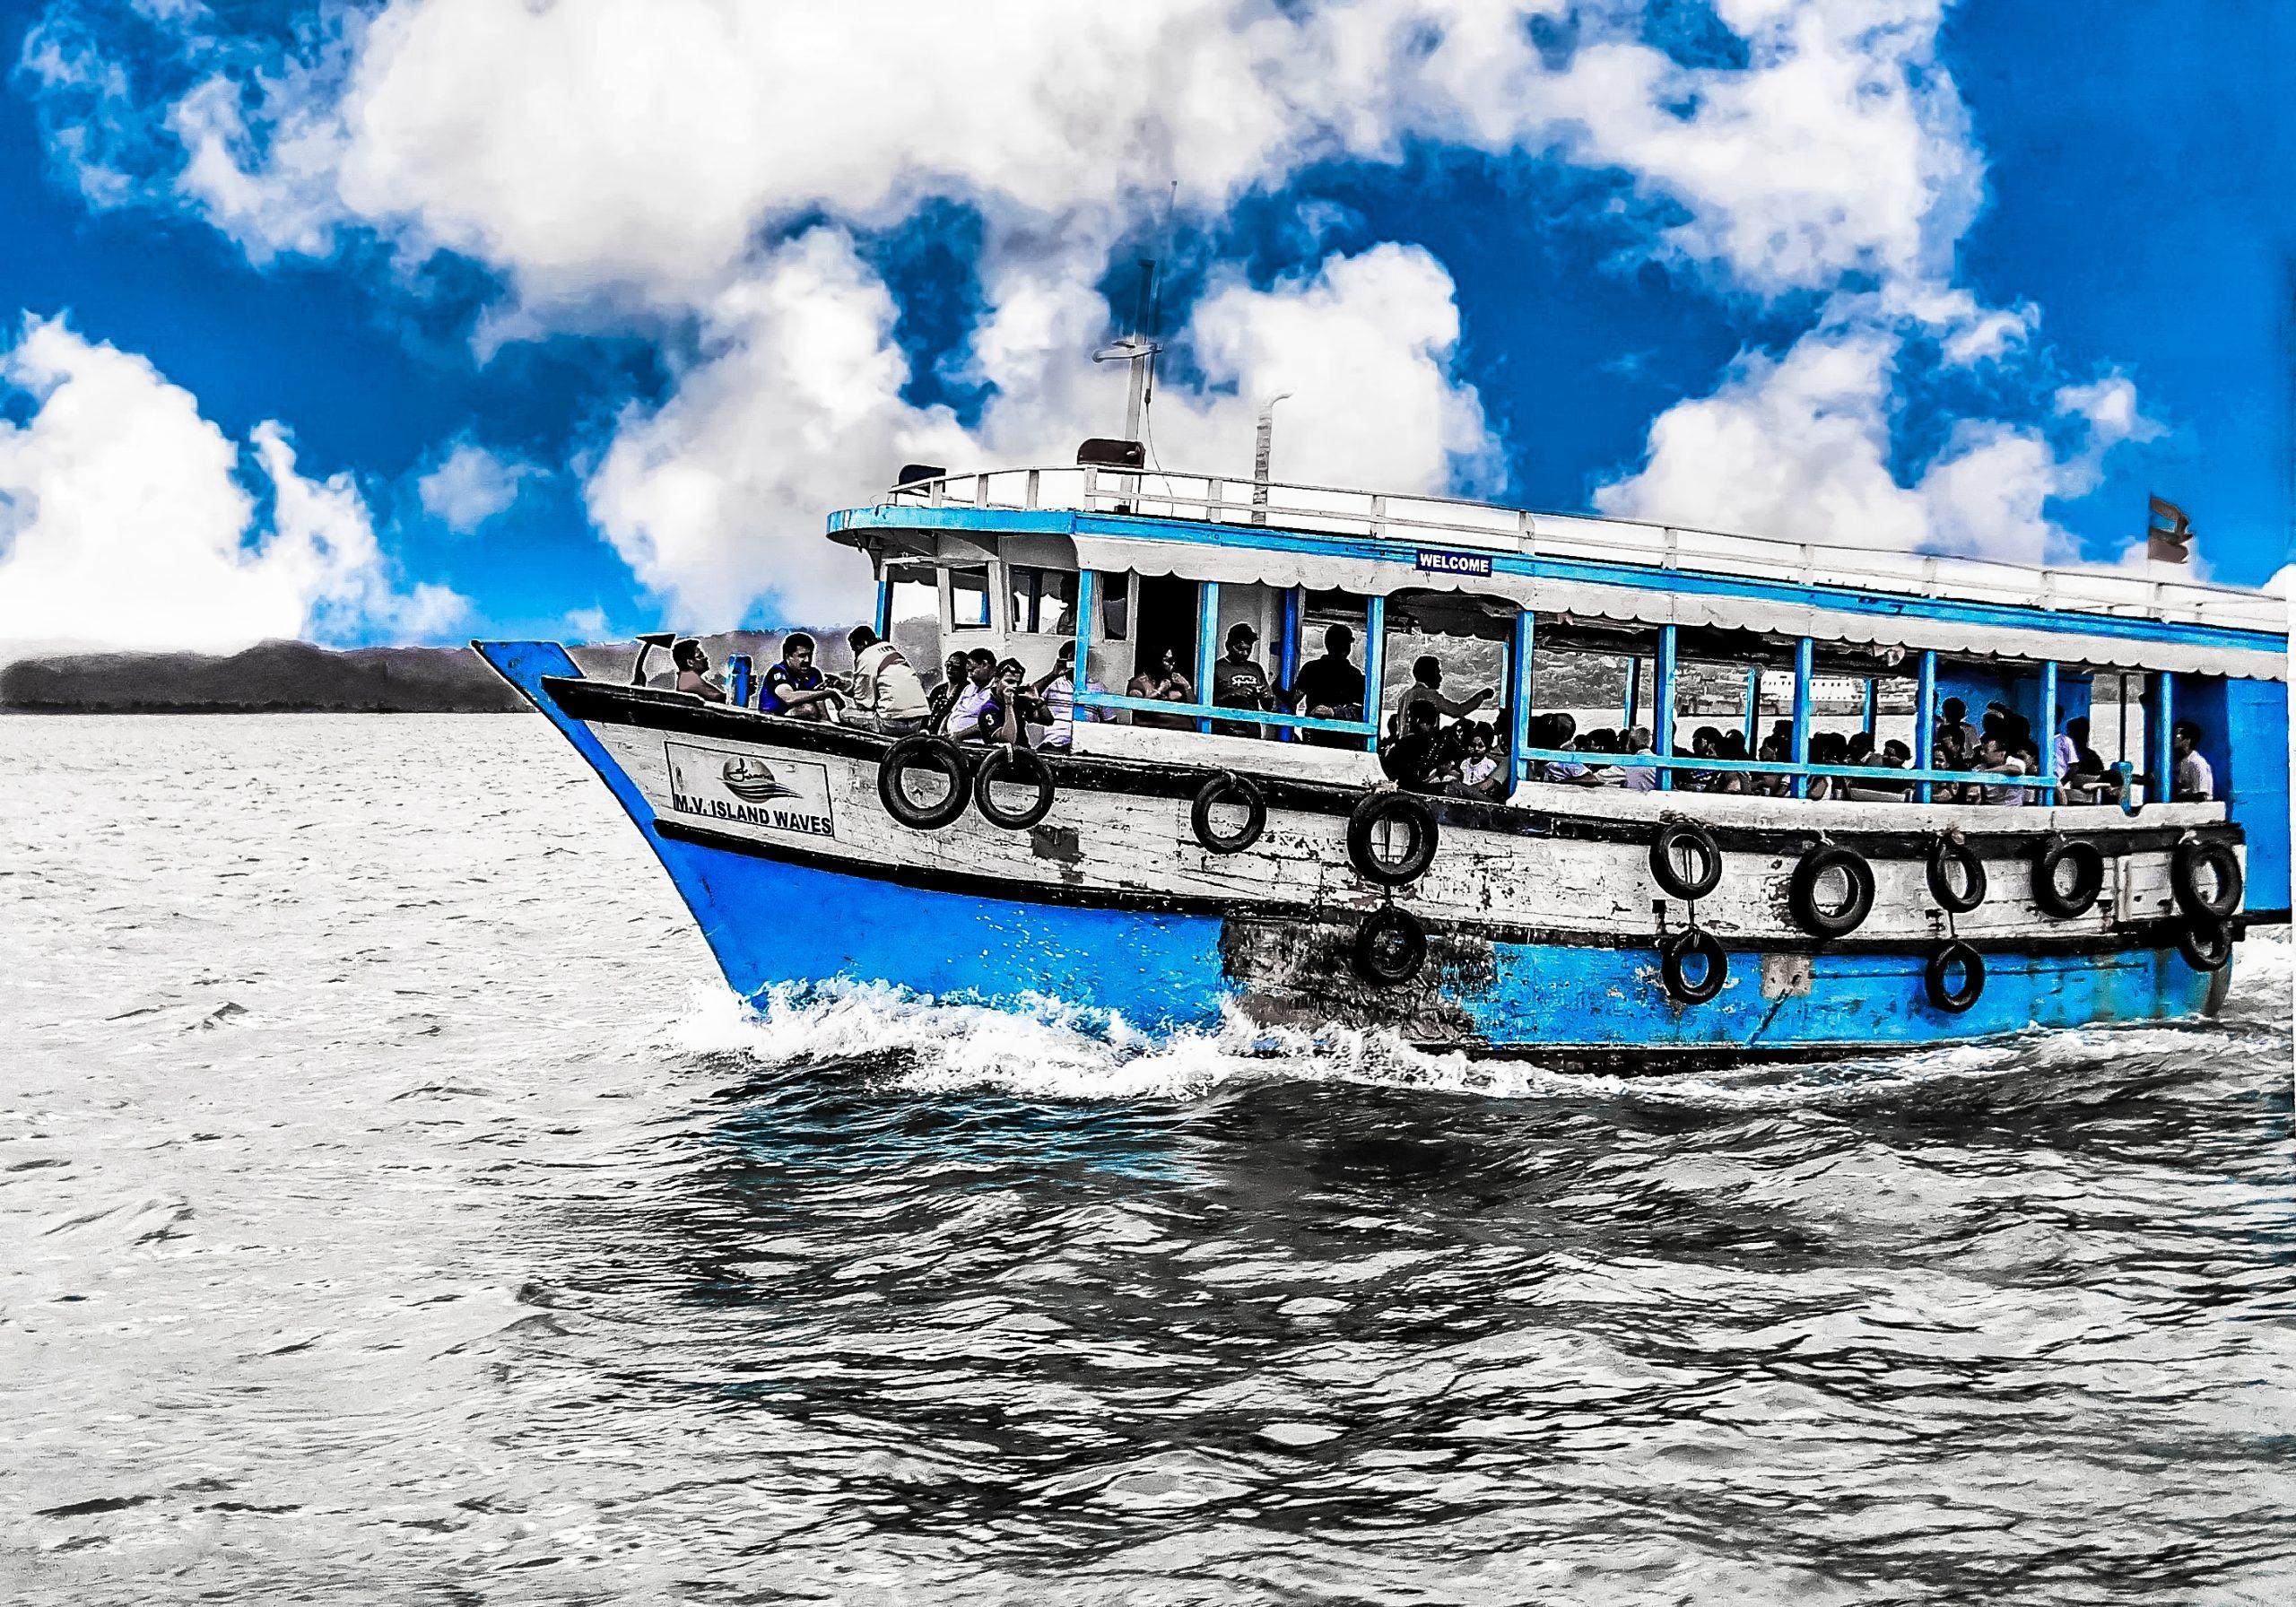 A passenger boat